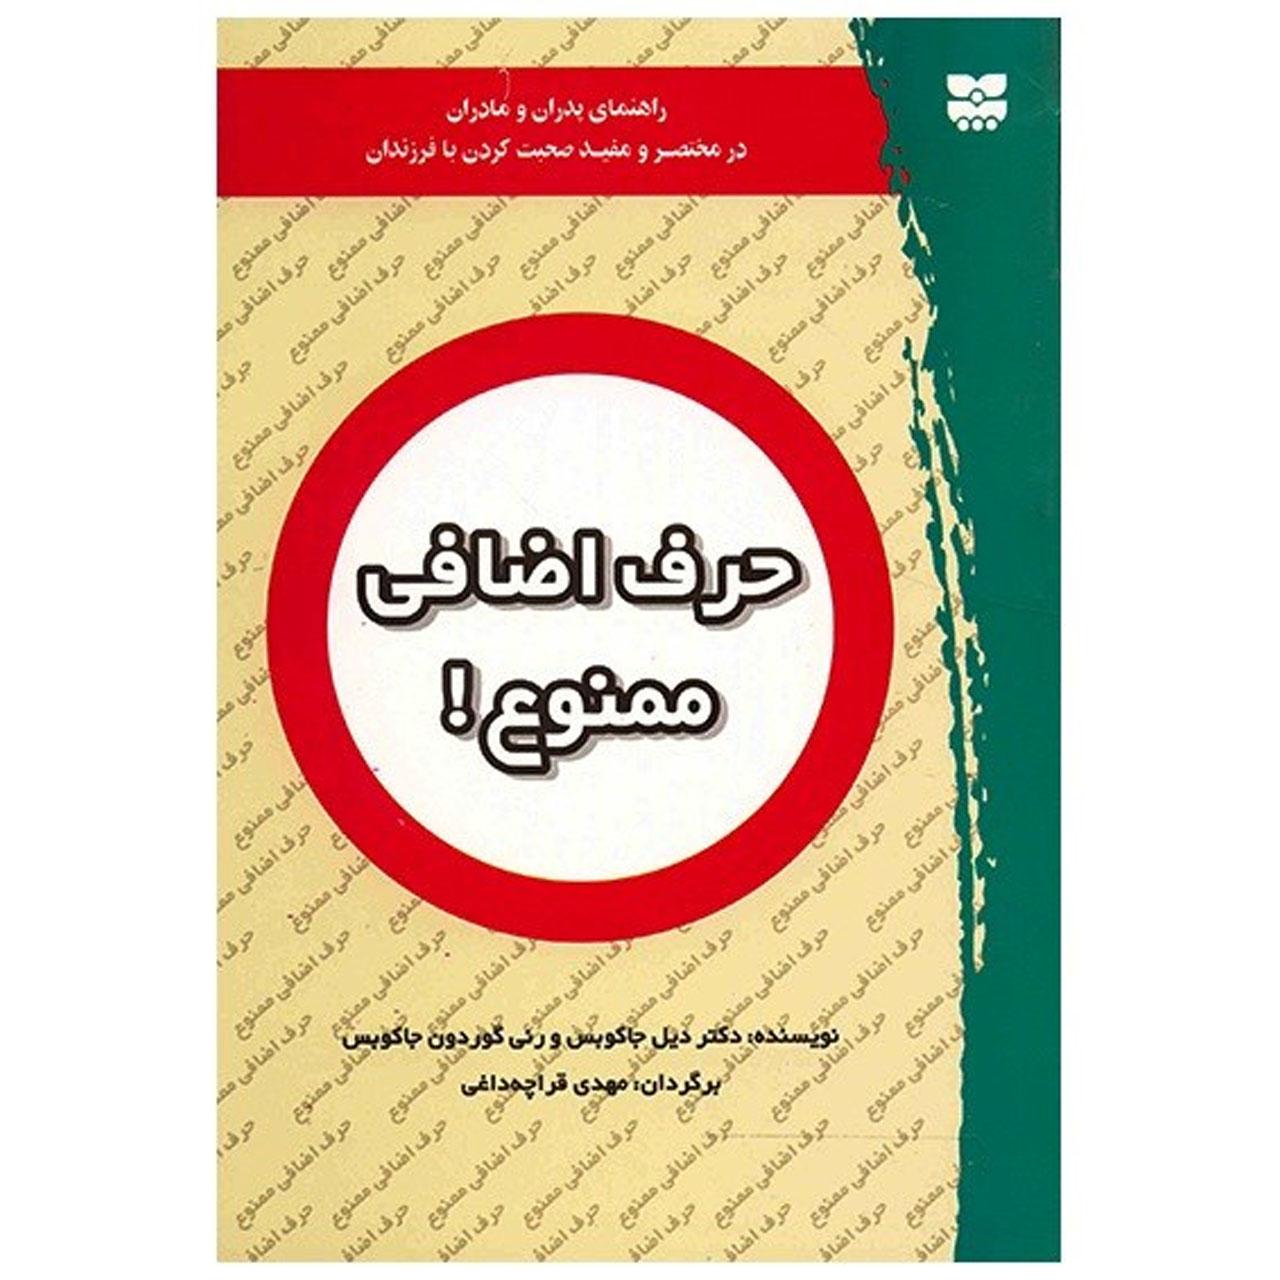 کتاب حرف اضافی ممنوع! اثر دیل جاکوبس